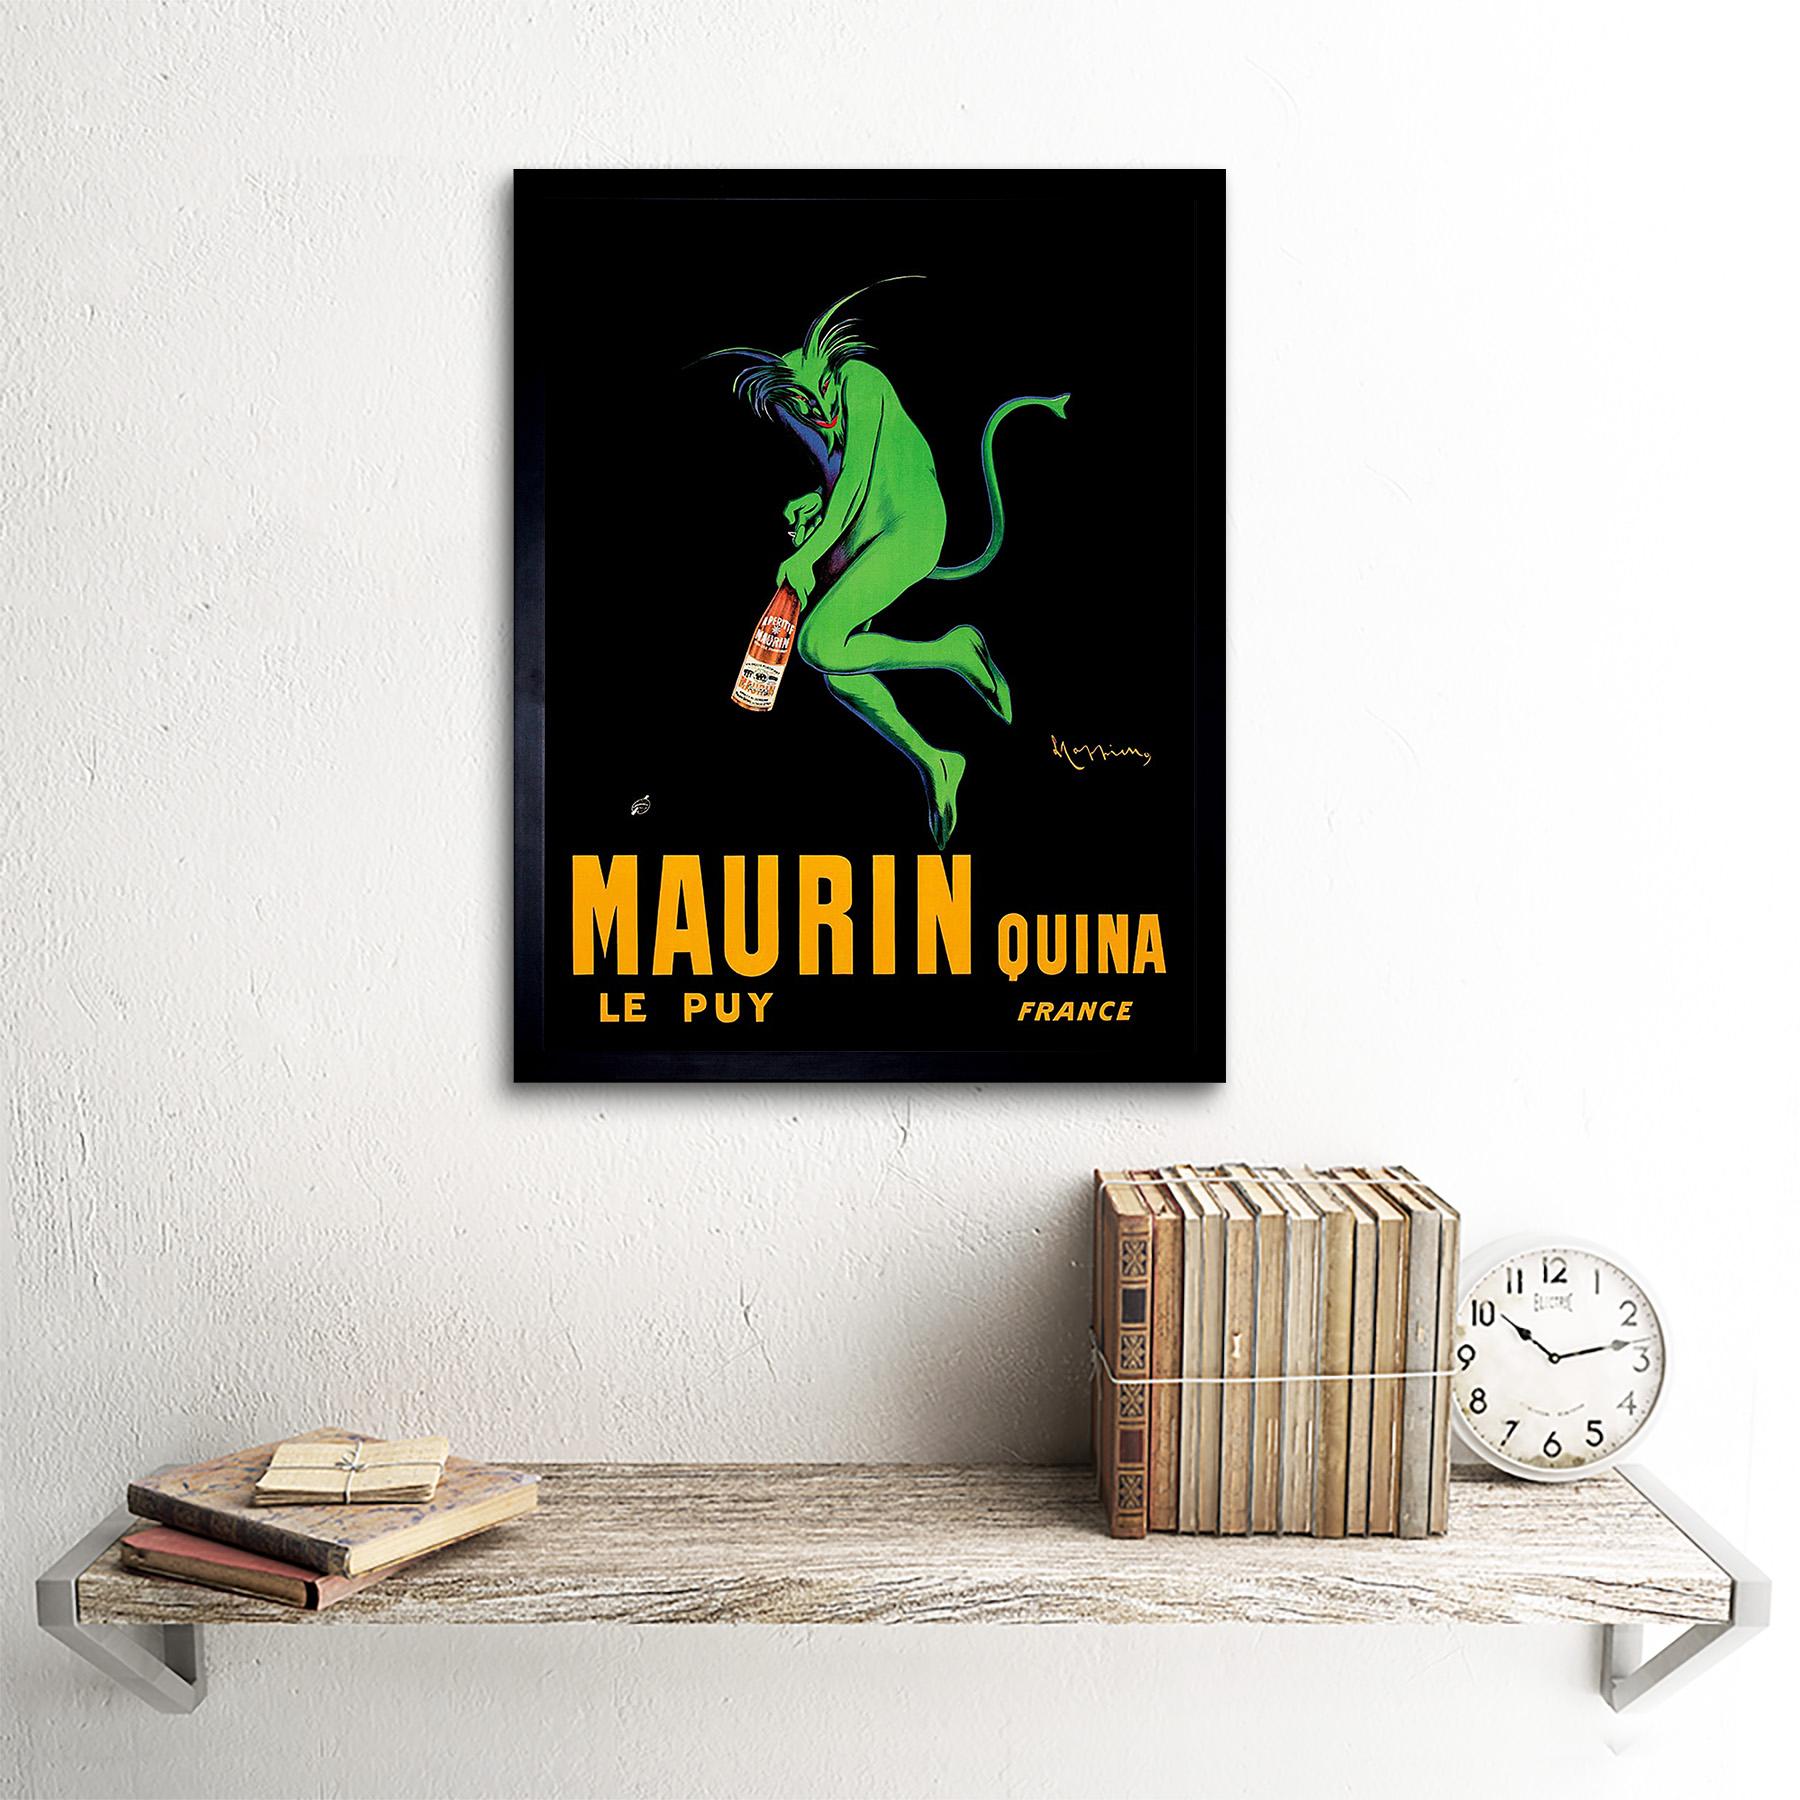 Advert Drink Alcohol Maurin Quina Green Devil France 12X16 Inch Framed Art Print